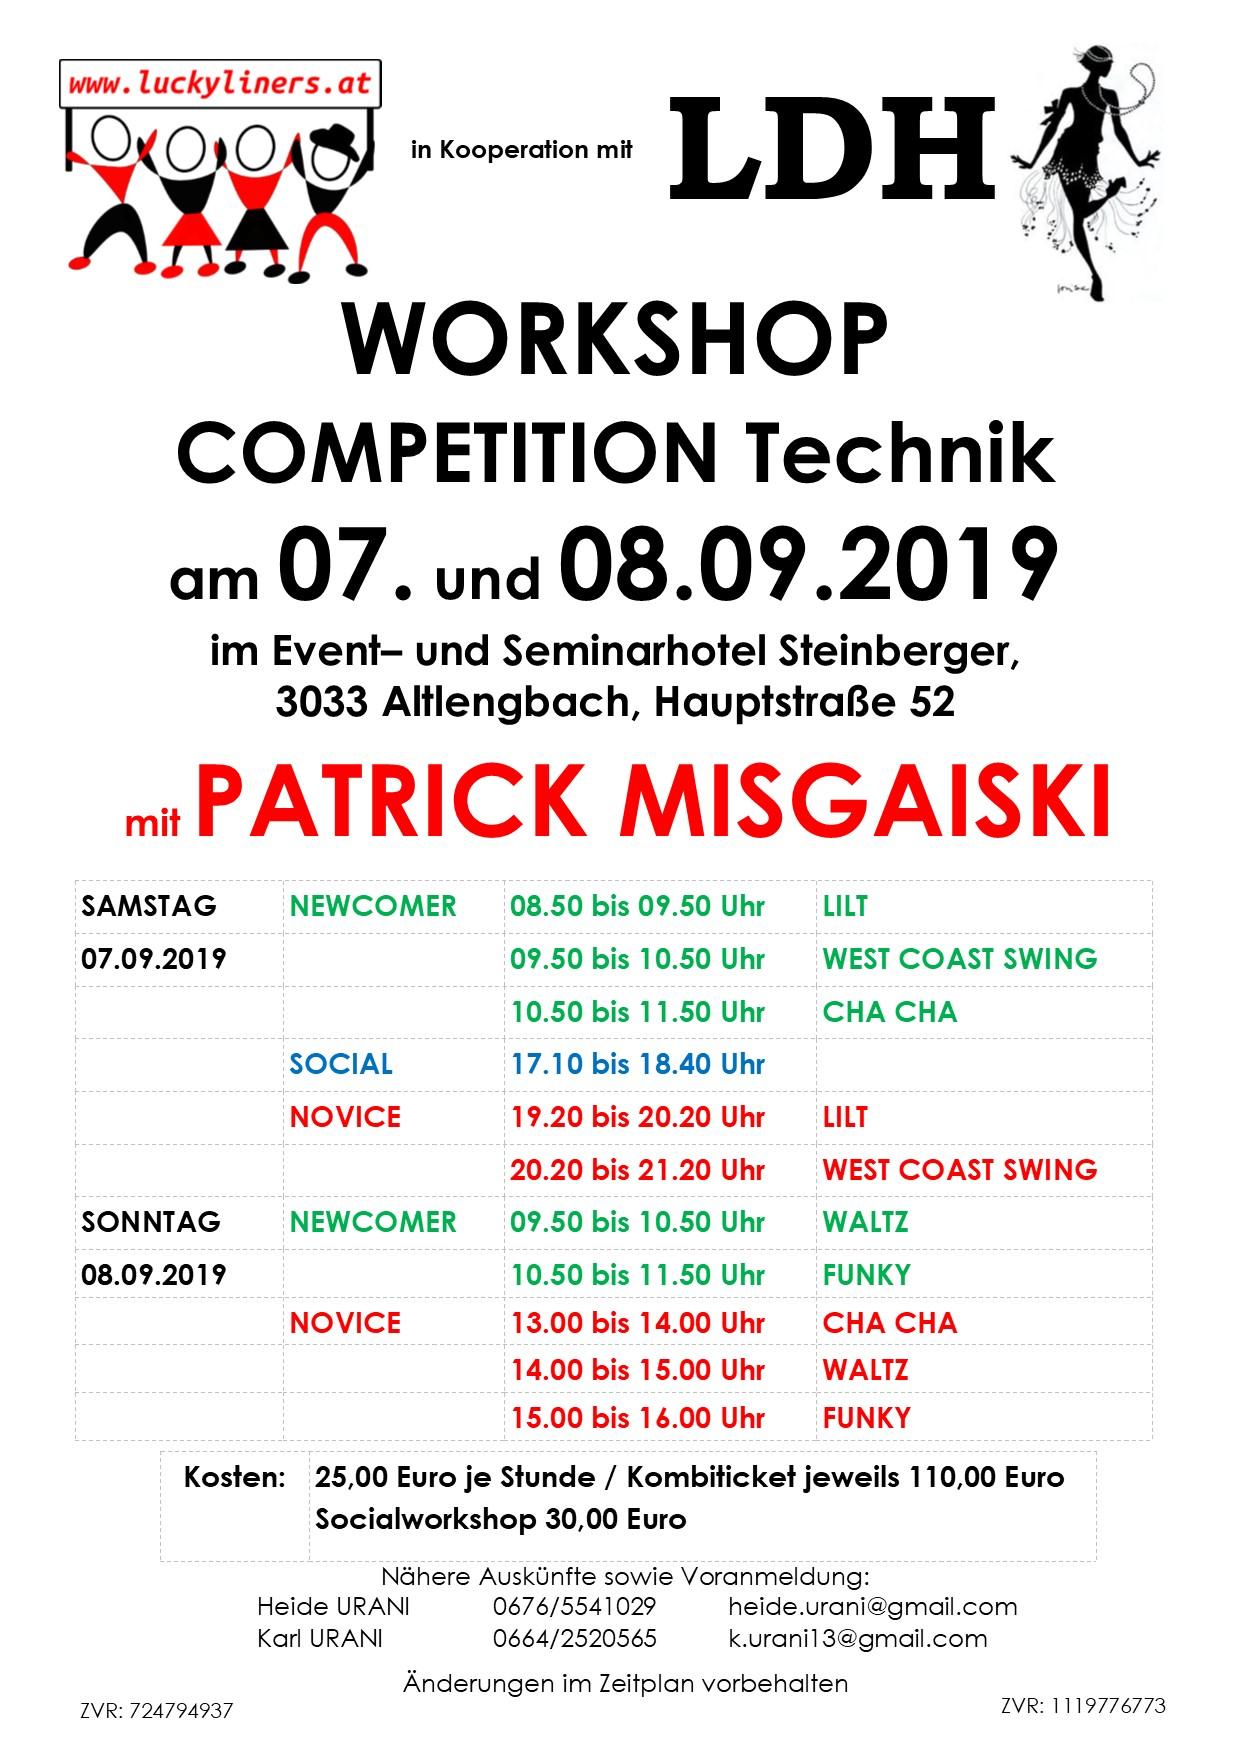 Korr WS 07.+08.09.2019 Misgaiski